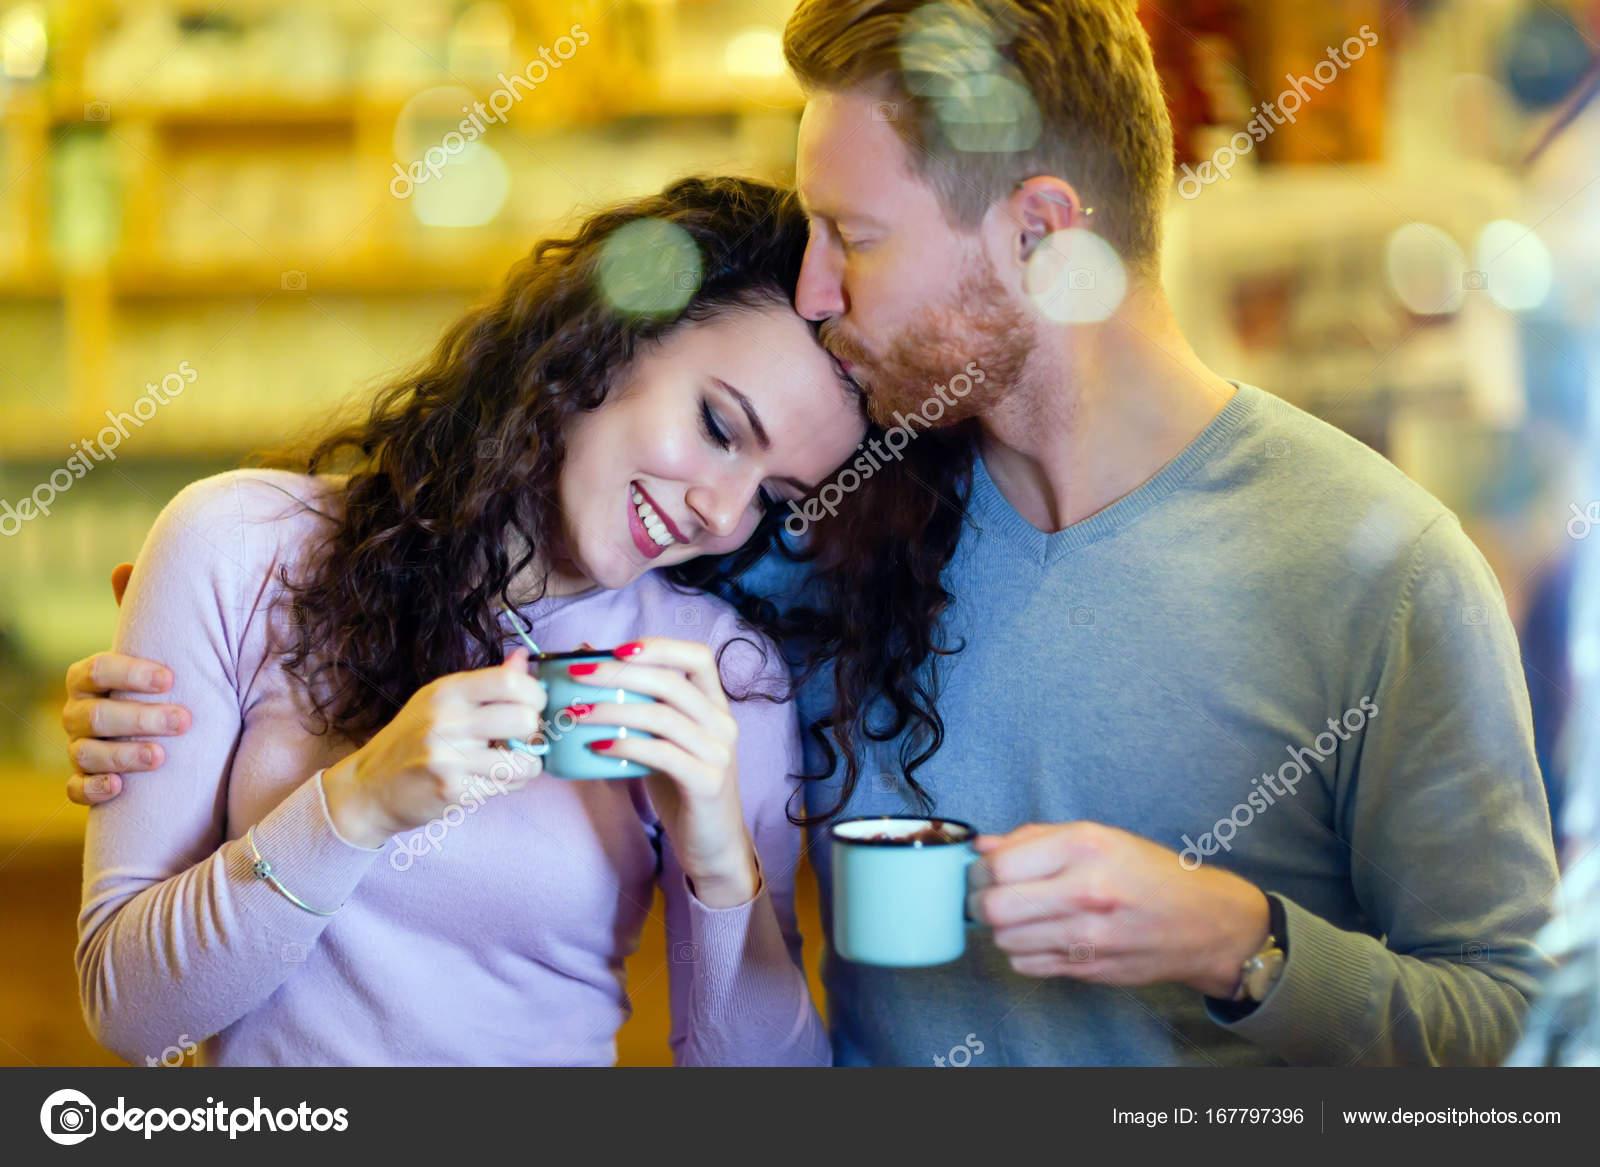 NYC dating lover hastighet dating lorain Ohio